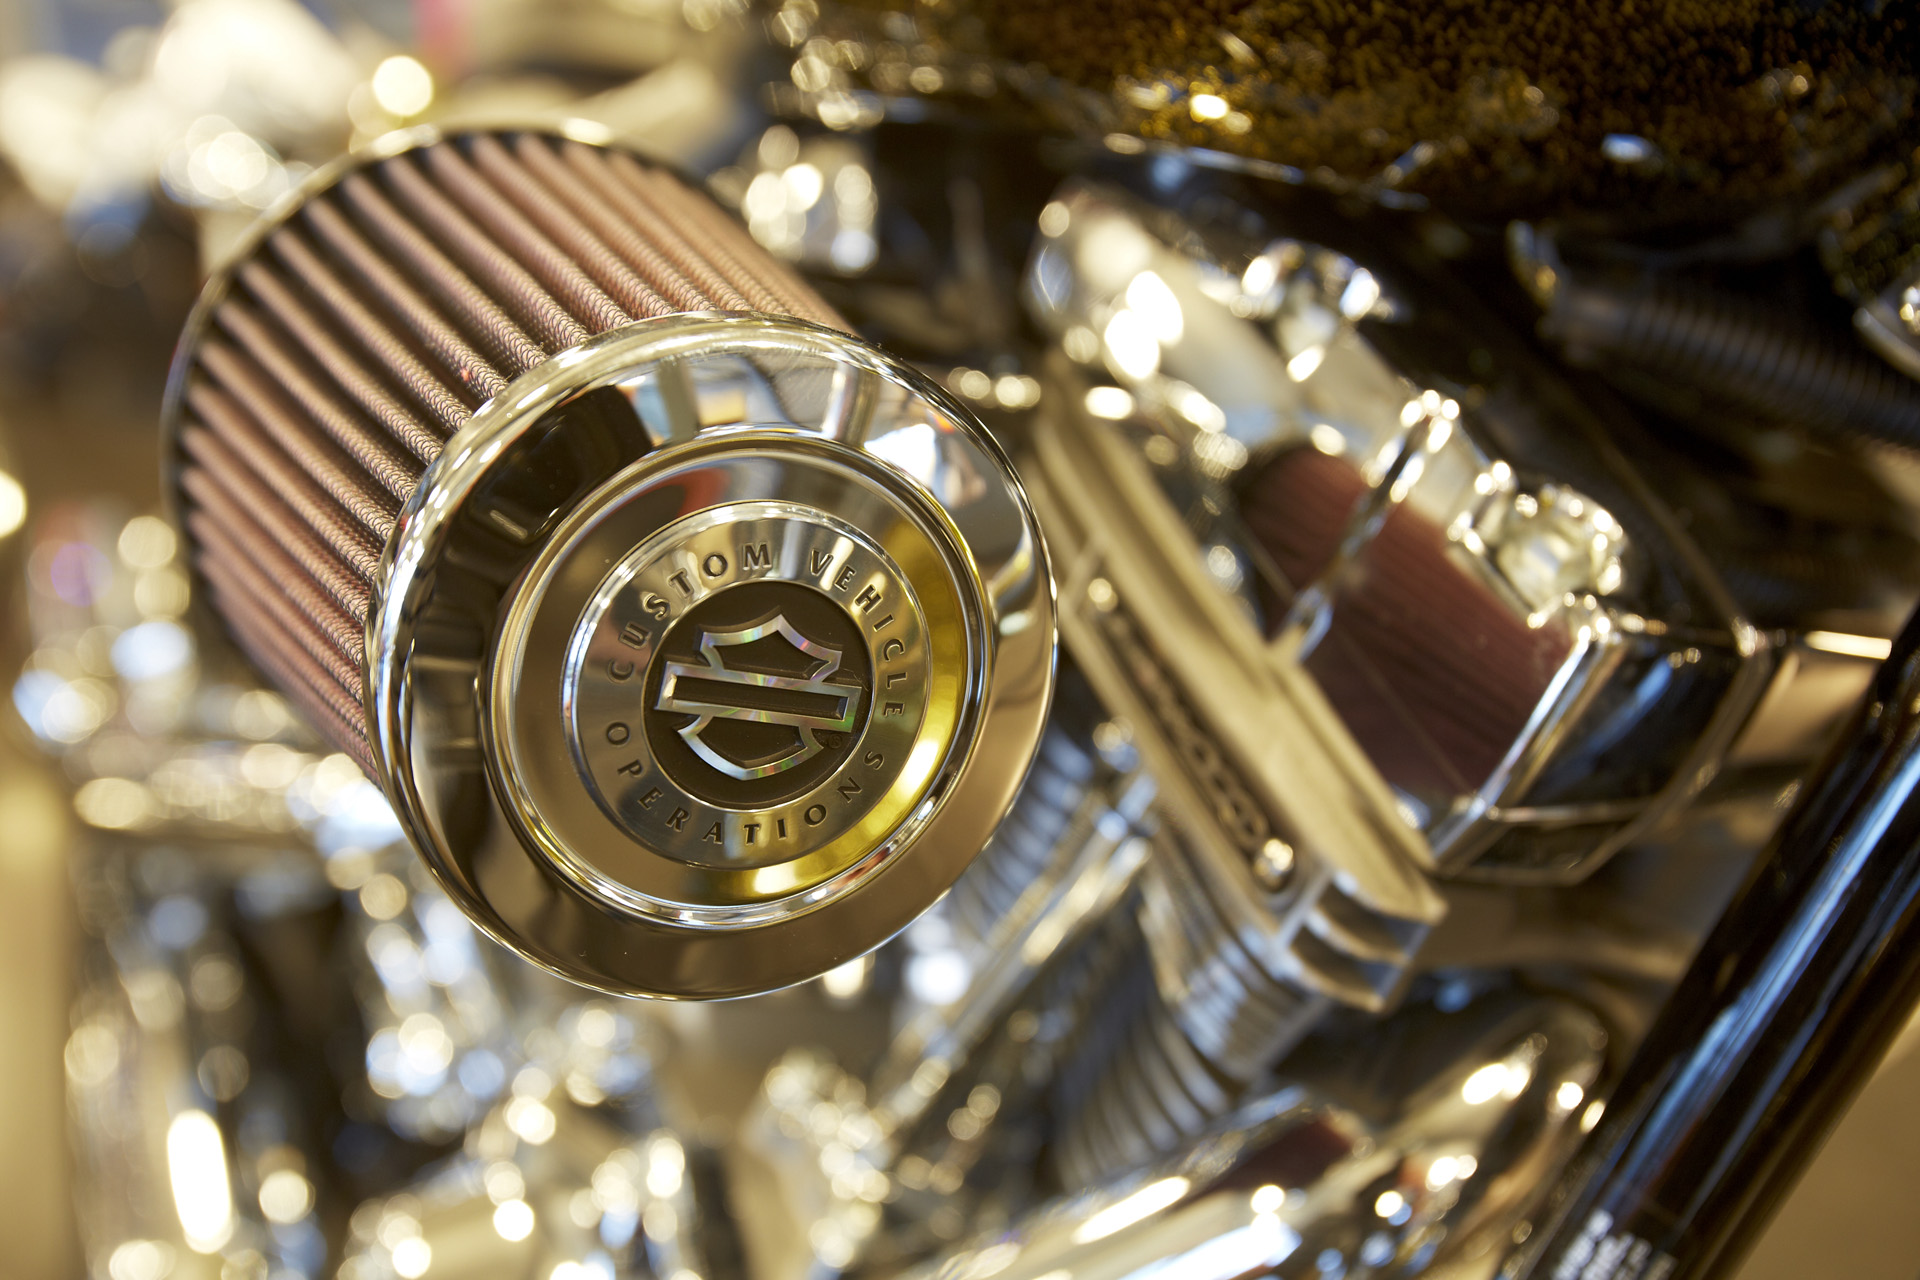 Bedrijfsreportage Harley Davidson Geel